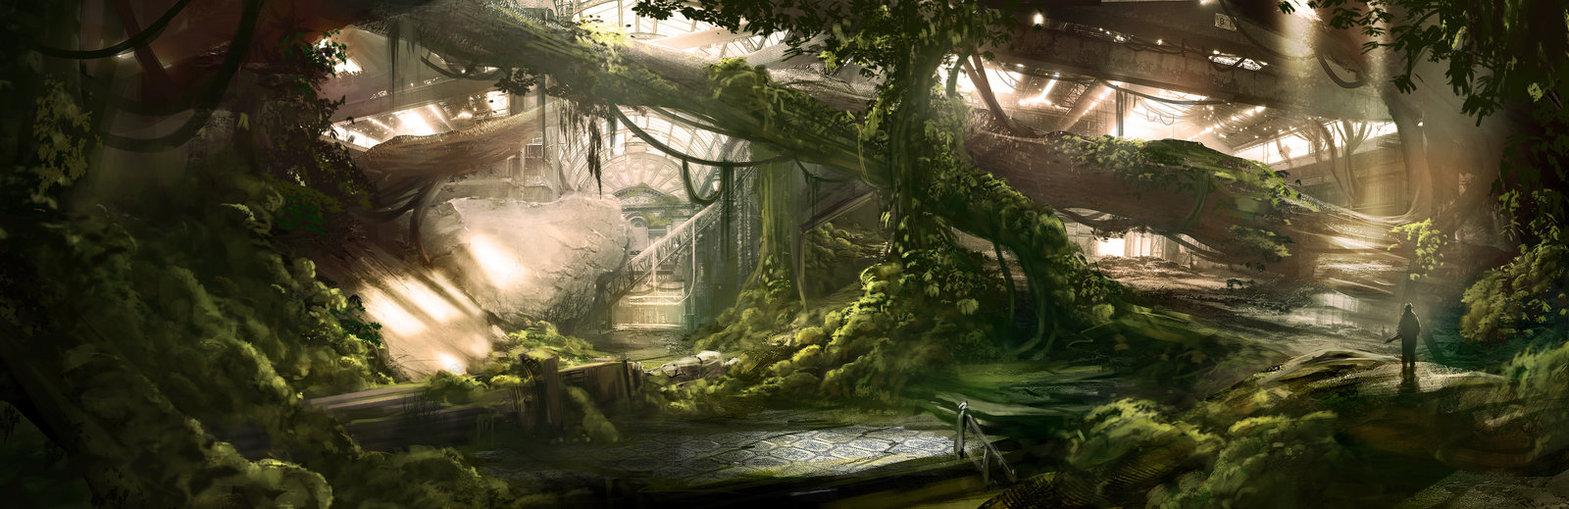 overgrown_arcade_by_jordangrimmer-d5yvte5.jpg